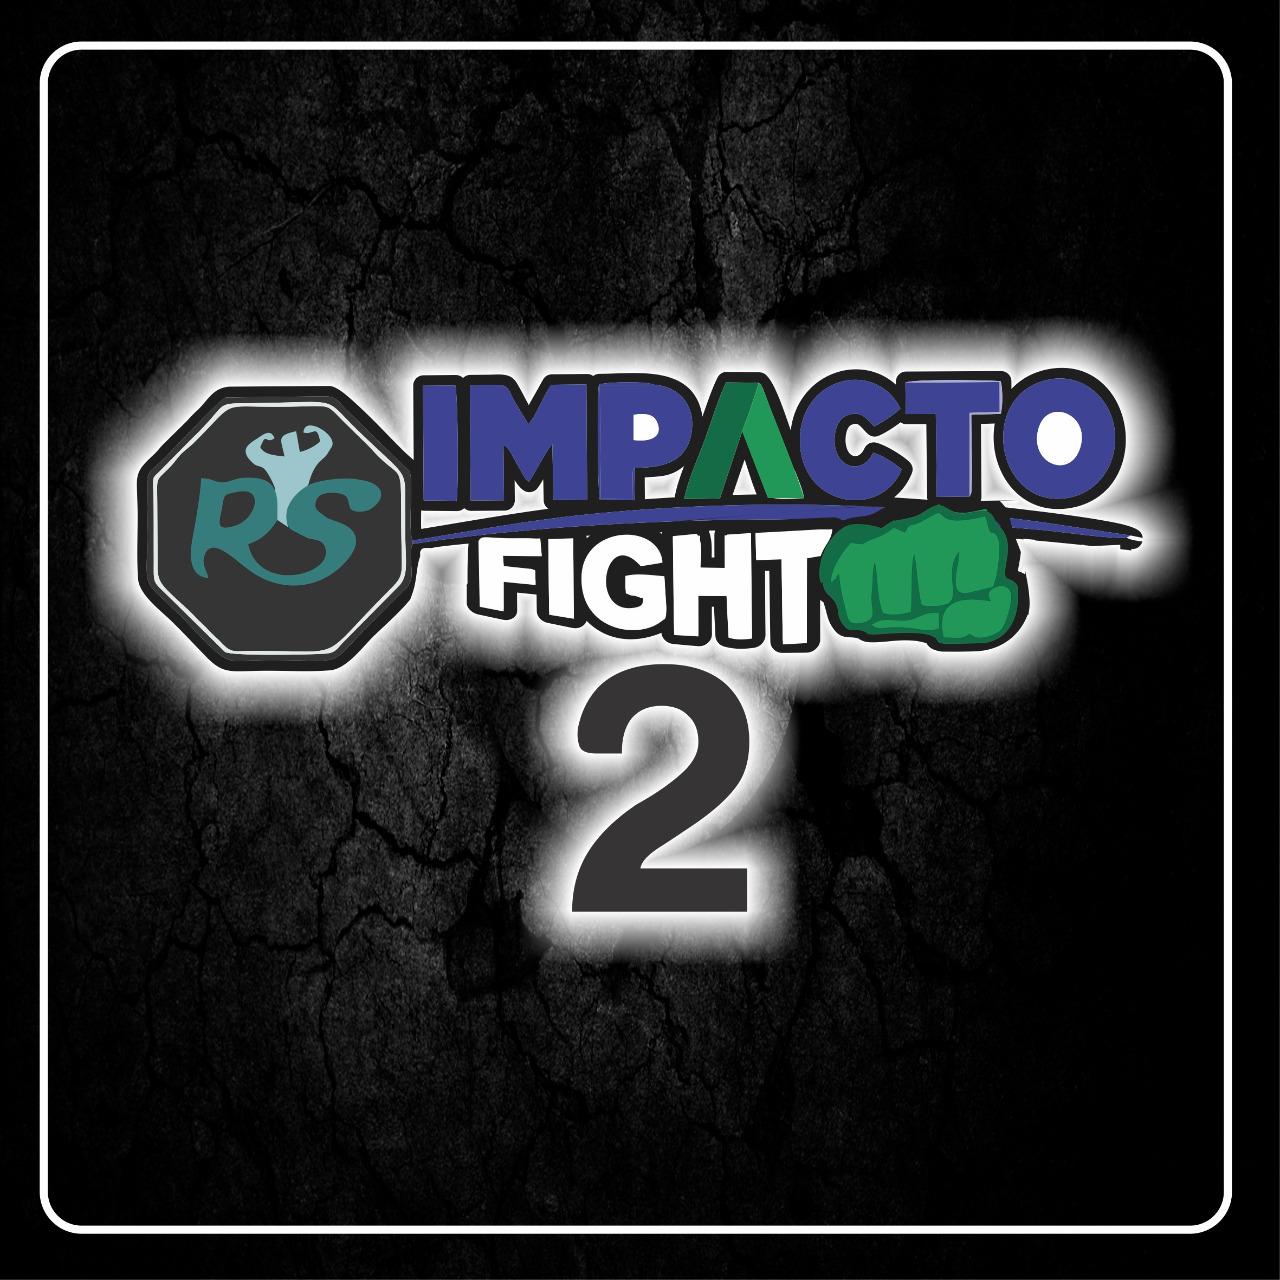 RS IMPACTO 2